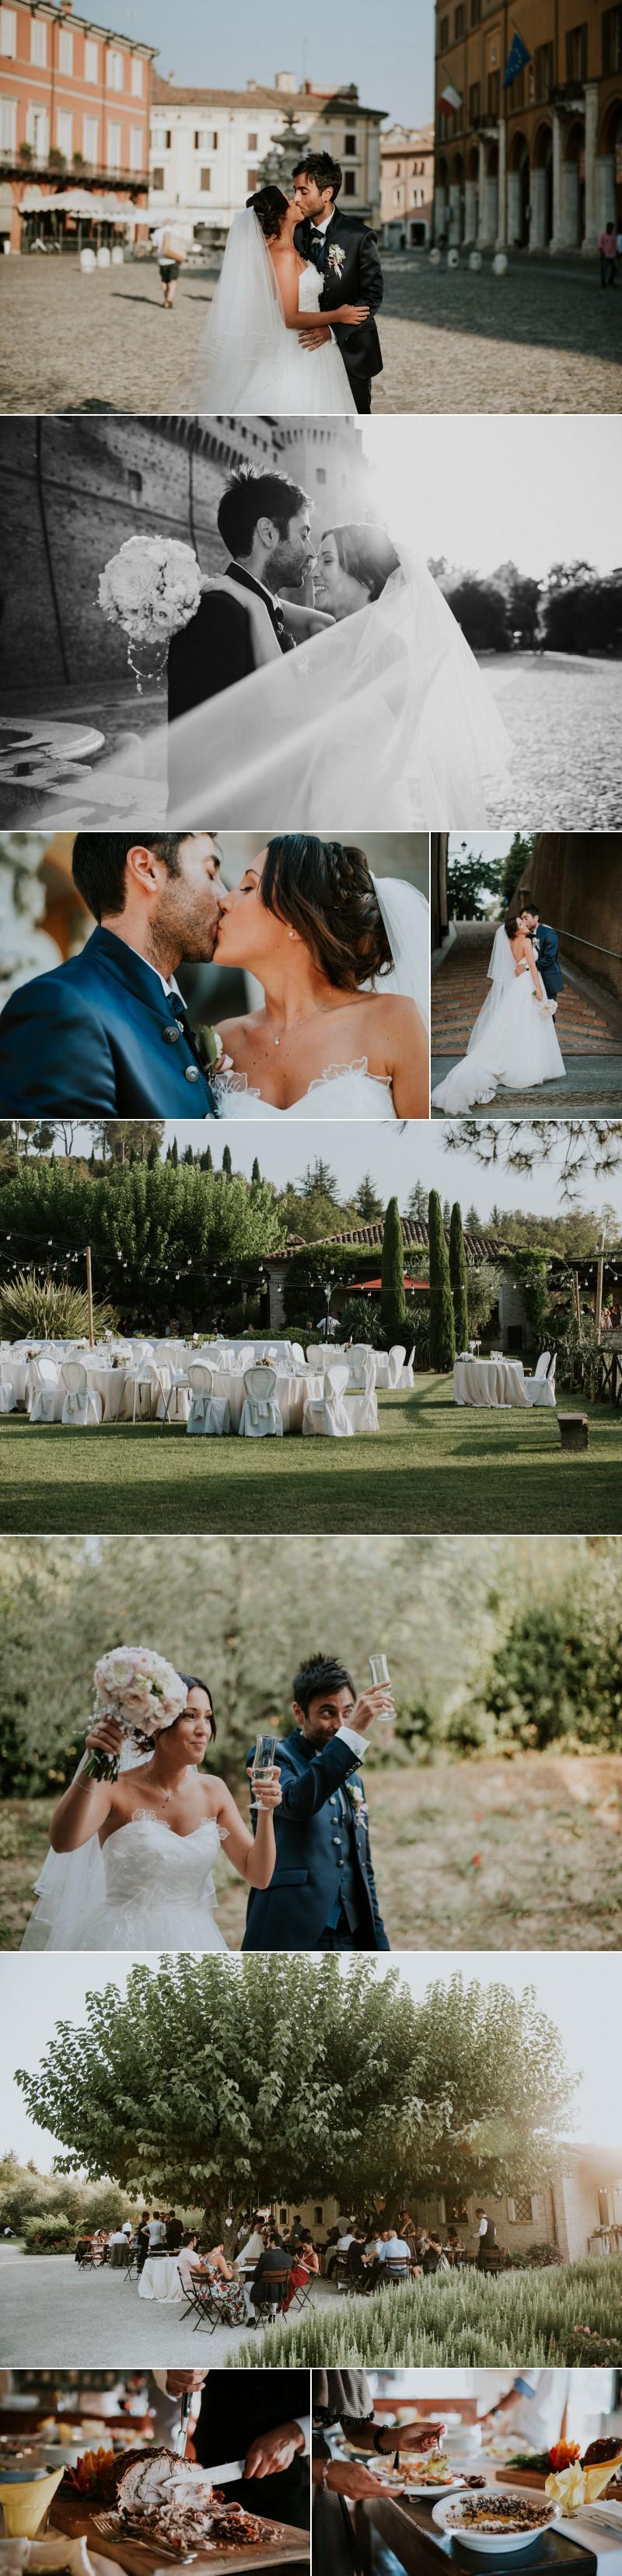 Fotografo Matrimonio Casa Celincordia Cesena 700